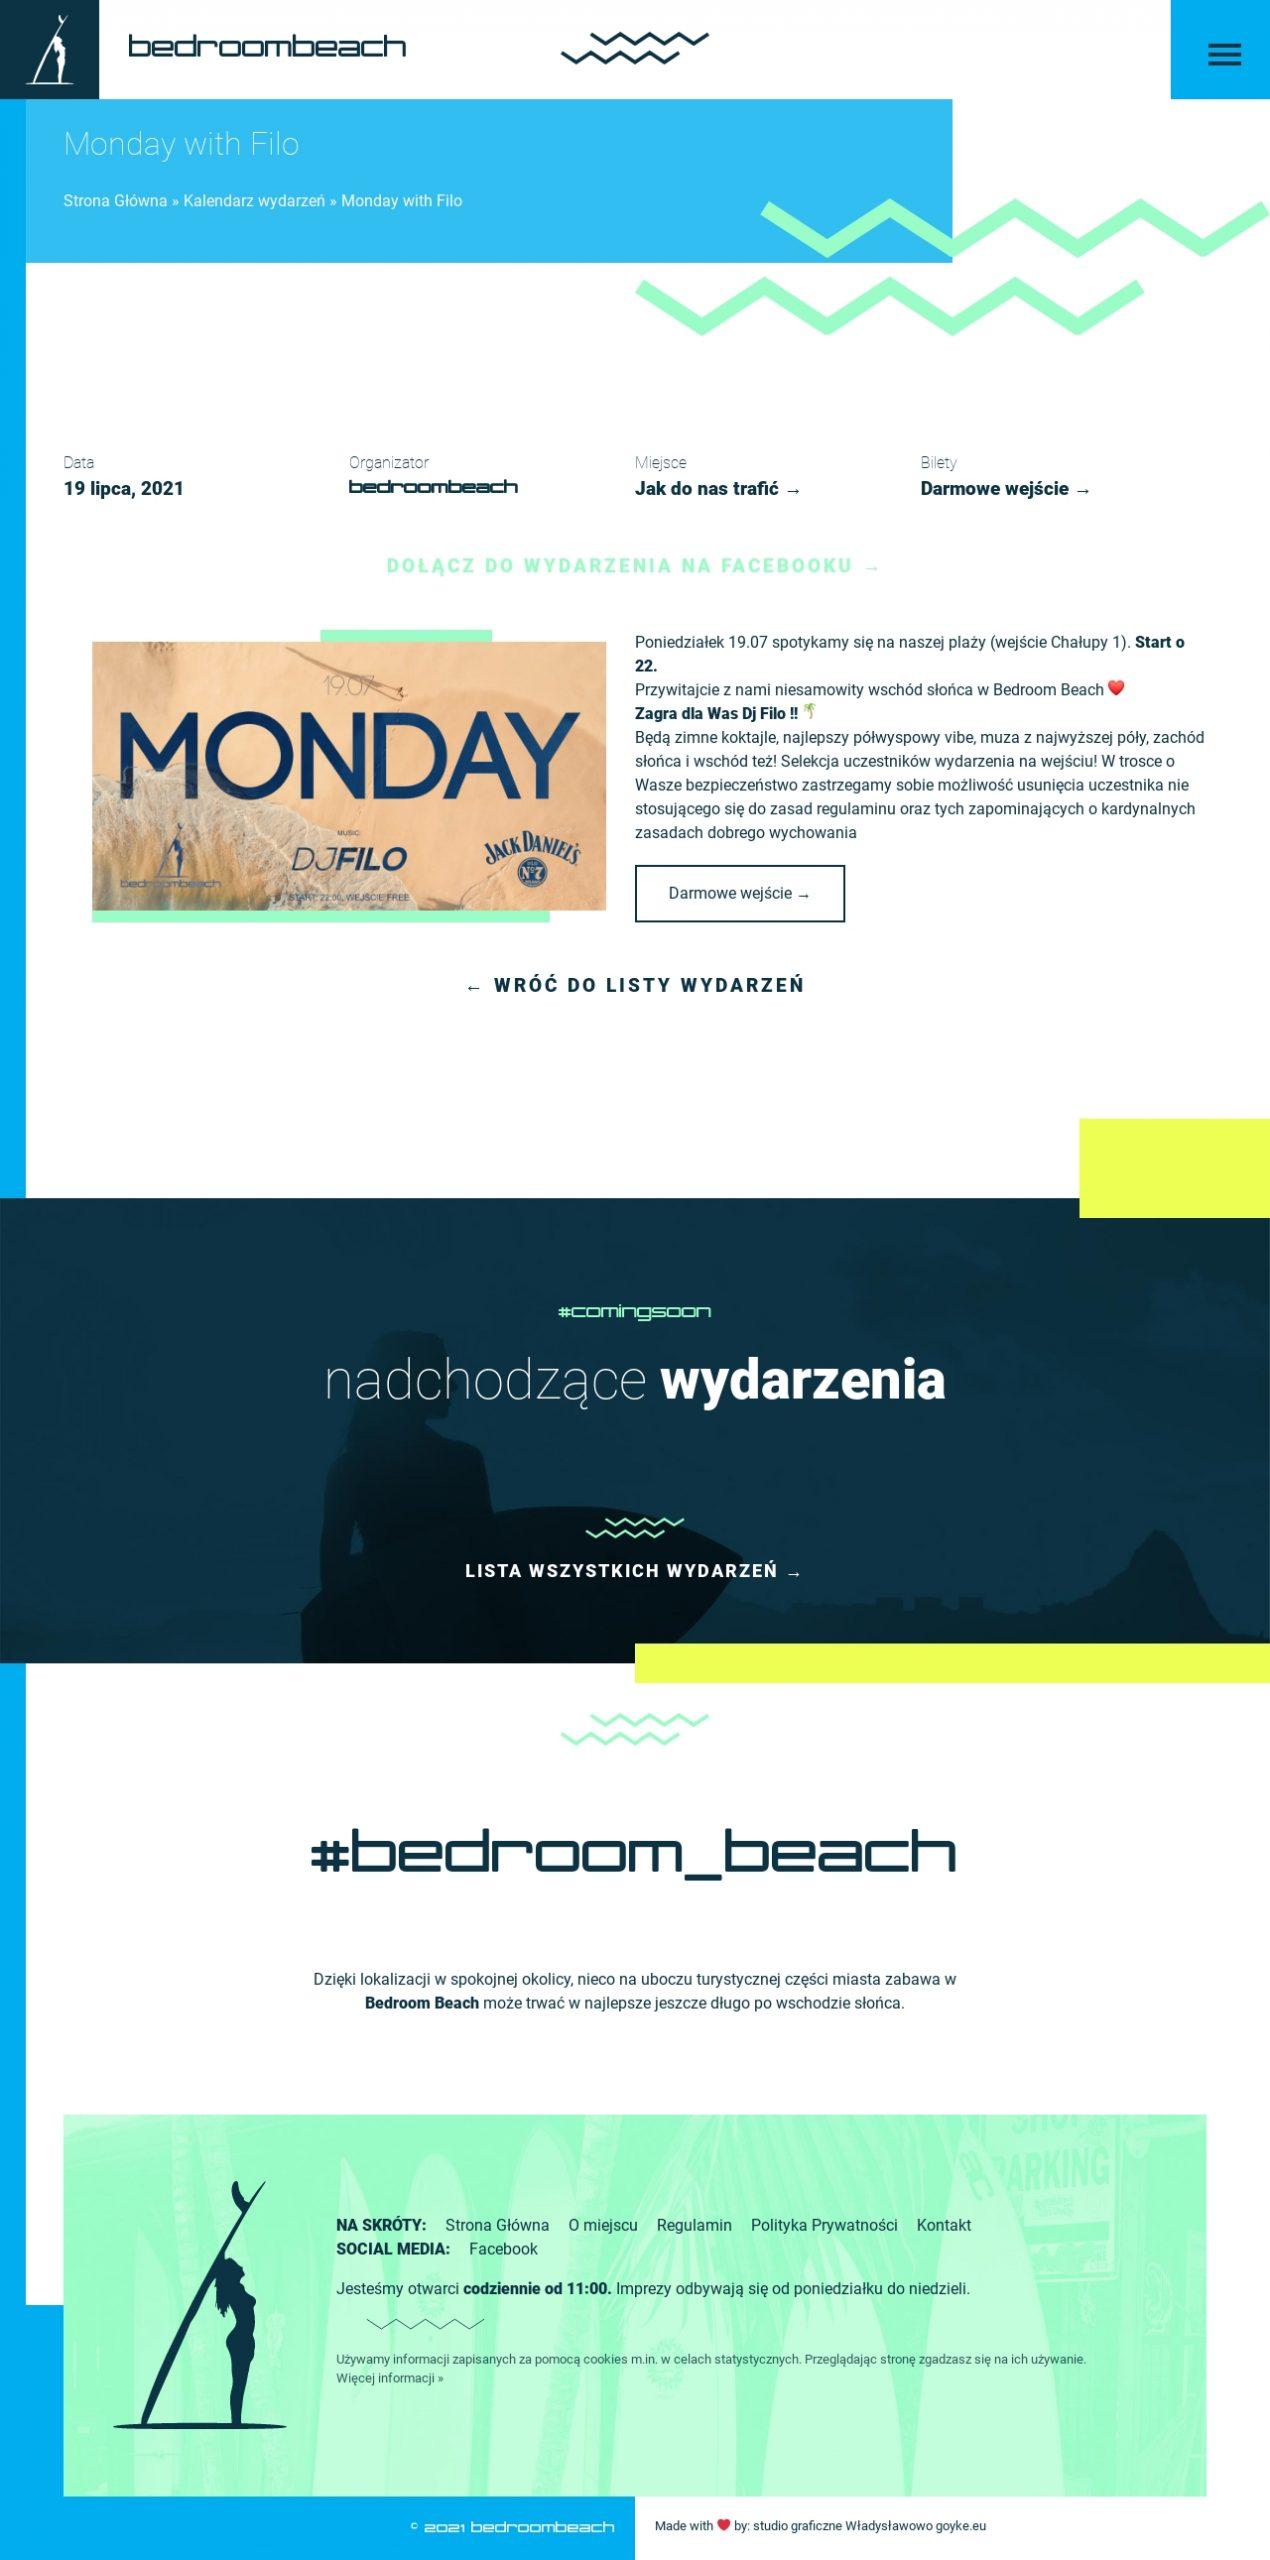 bedroom beach strona www